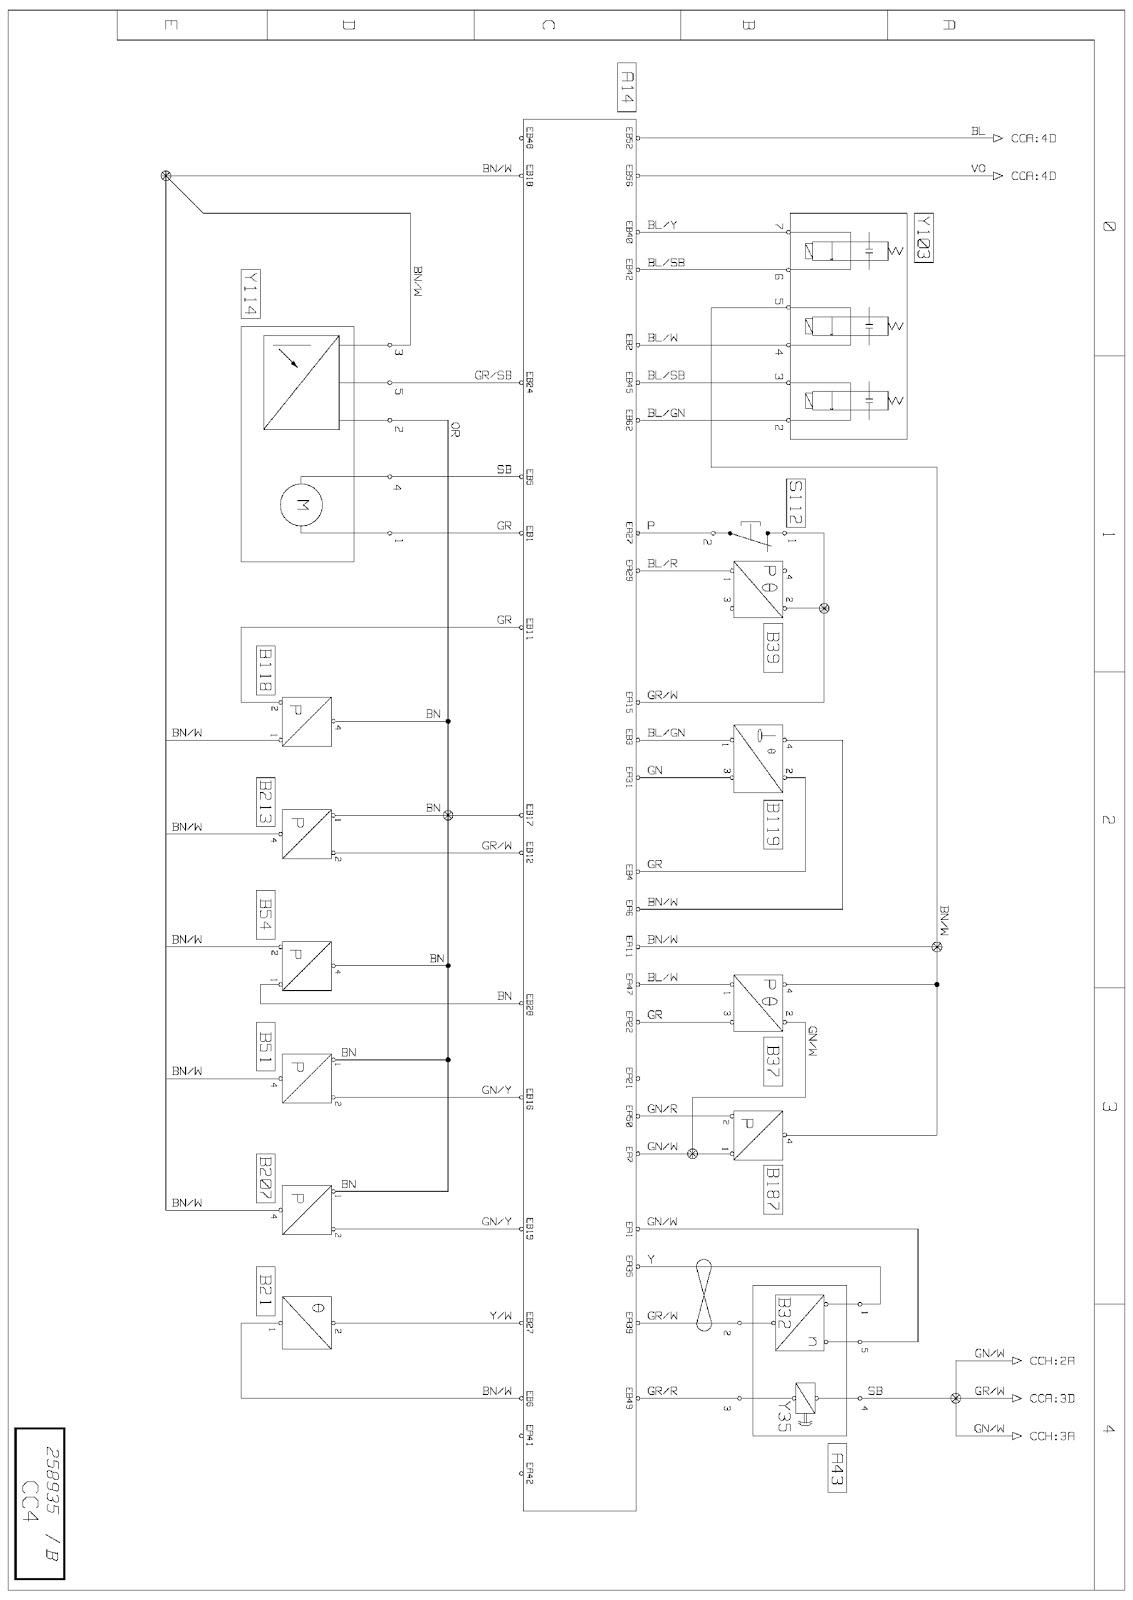 small resolution of a43 engine fan speed regulator unit b3d b21 combustion engine coolant circuit temperature sensor b3d b32 engine cooling fan speed sensor b3d